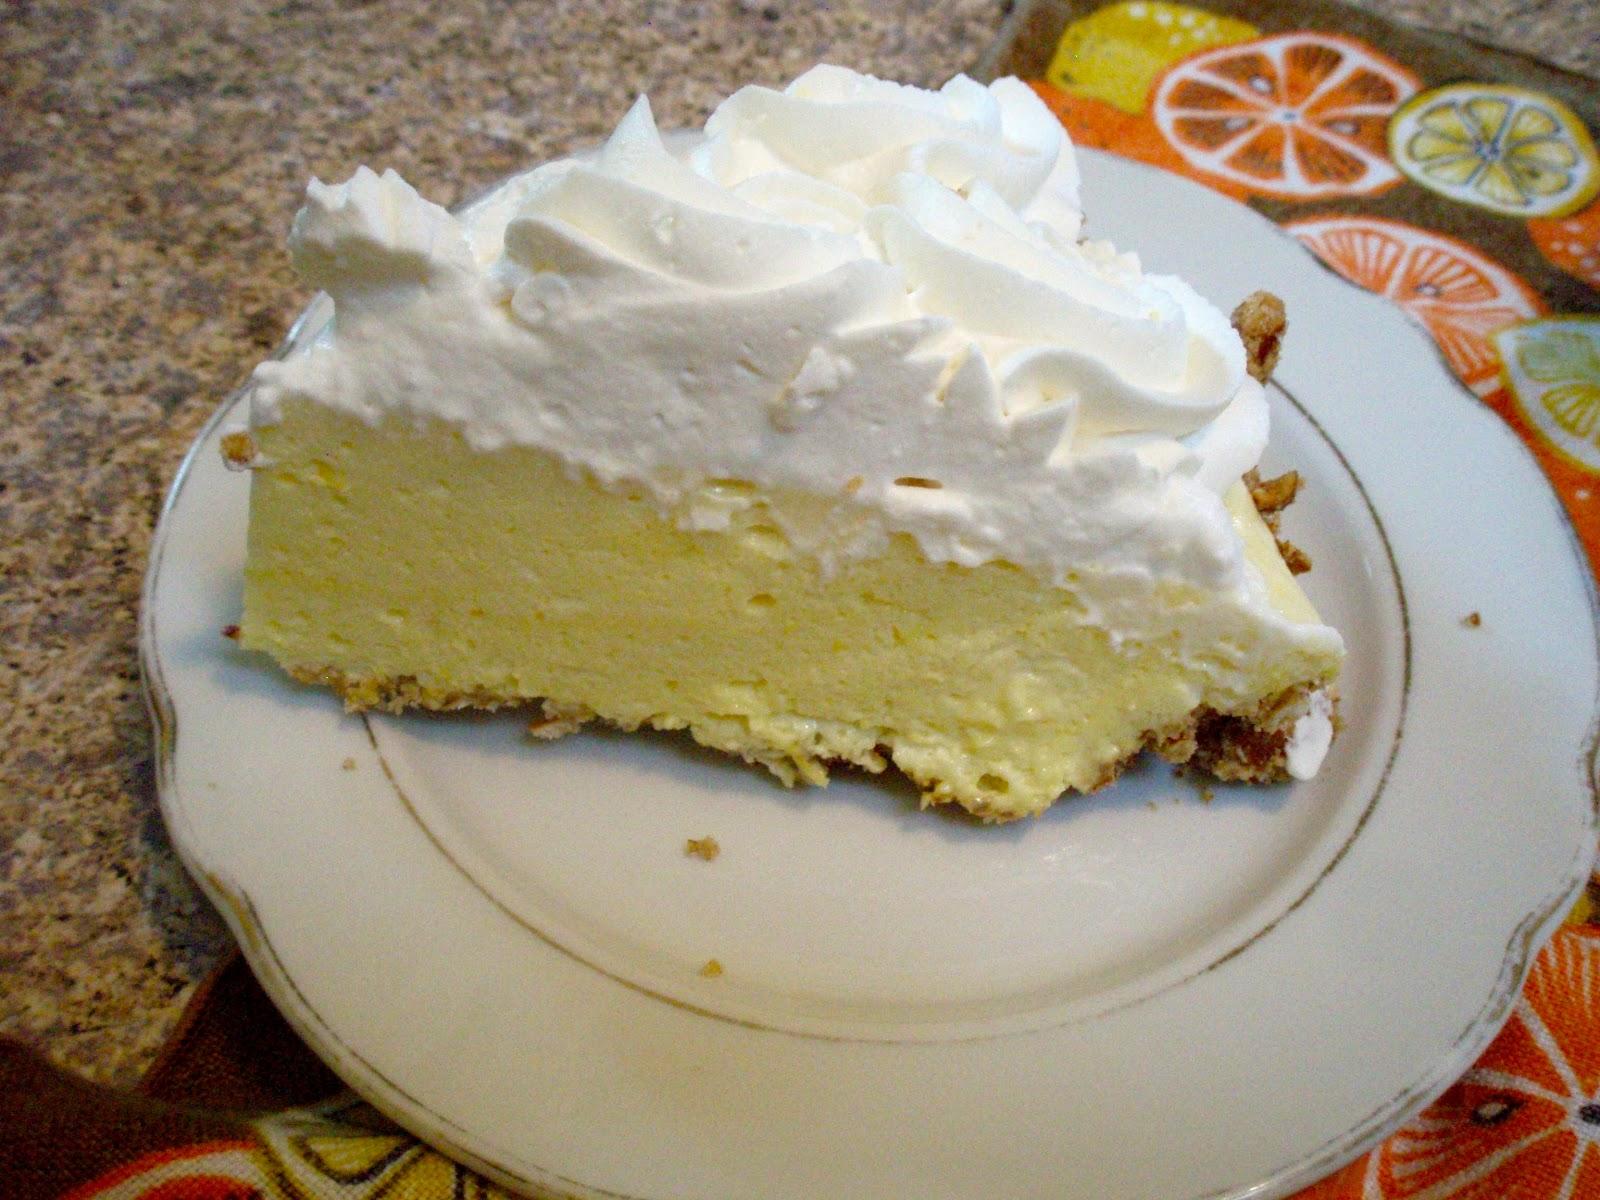 Lovinspoonfull: Lemon Chiffon Pie with Pretzel Crust